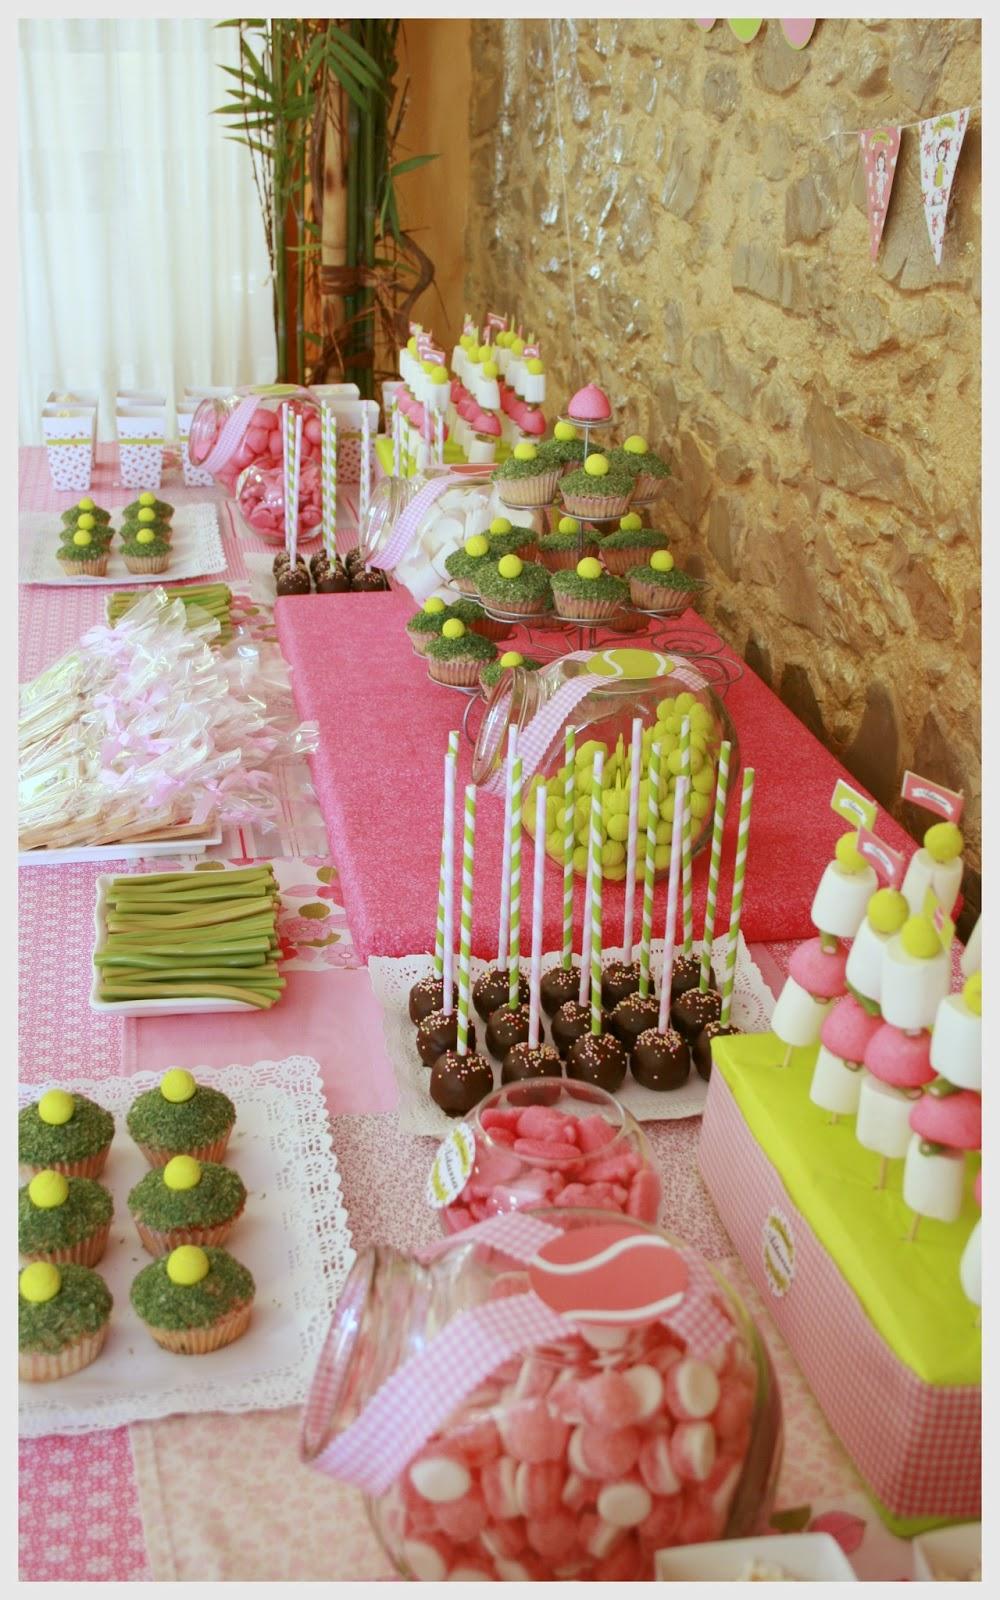 Cosas con encanto fiesta de primera comunion con candy - Fotos de mesas decoradas ...